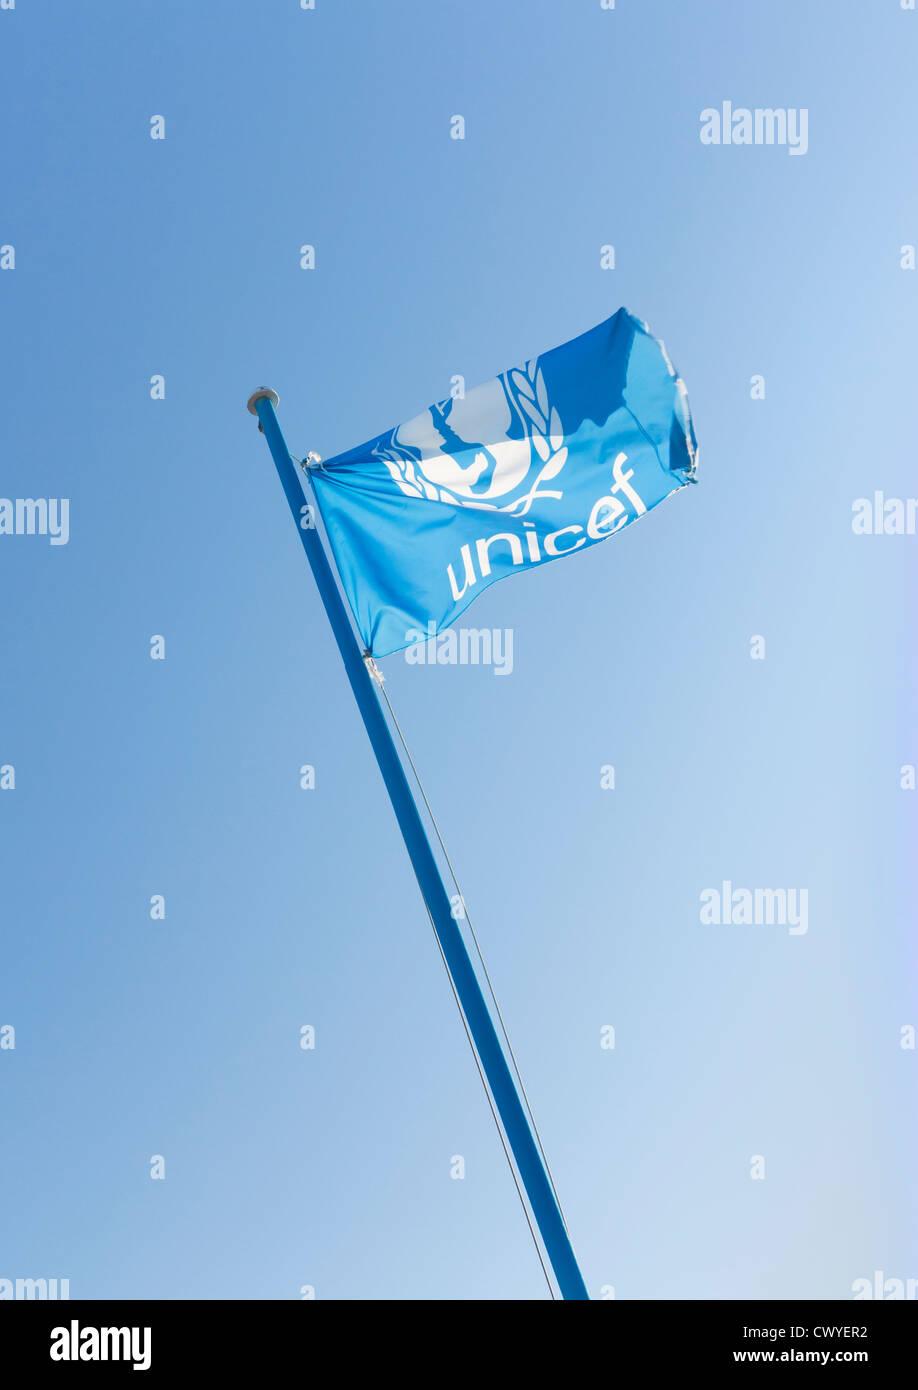 Unicef Flag  flagsonlineit